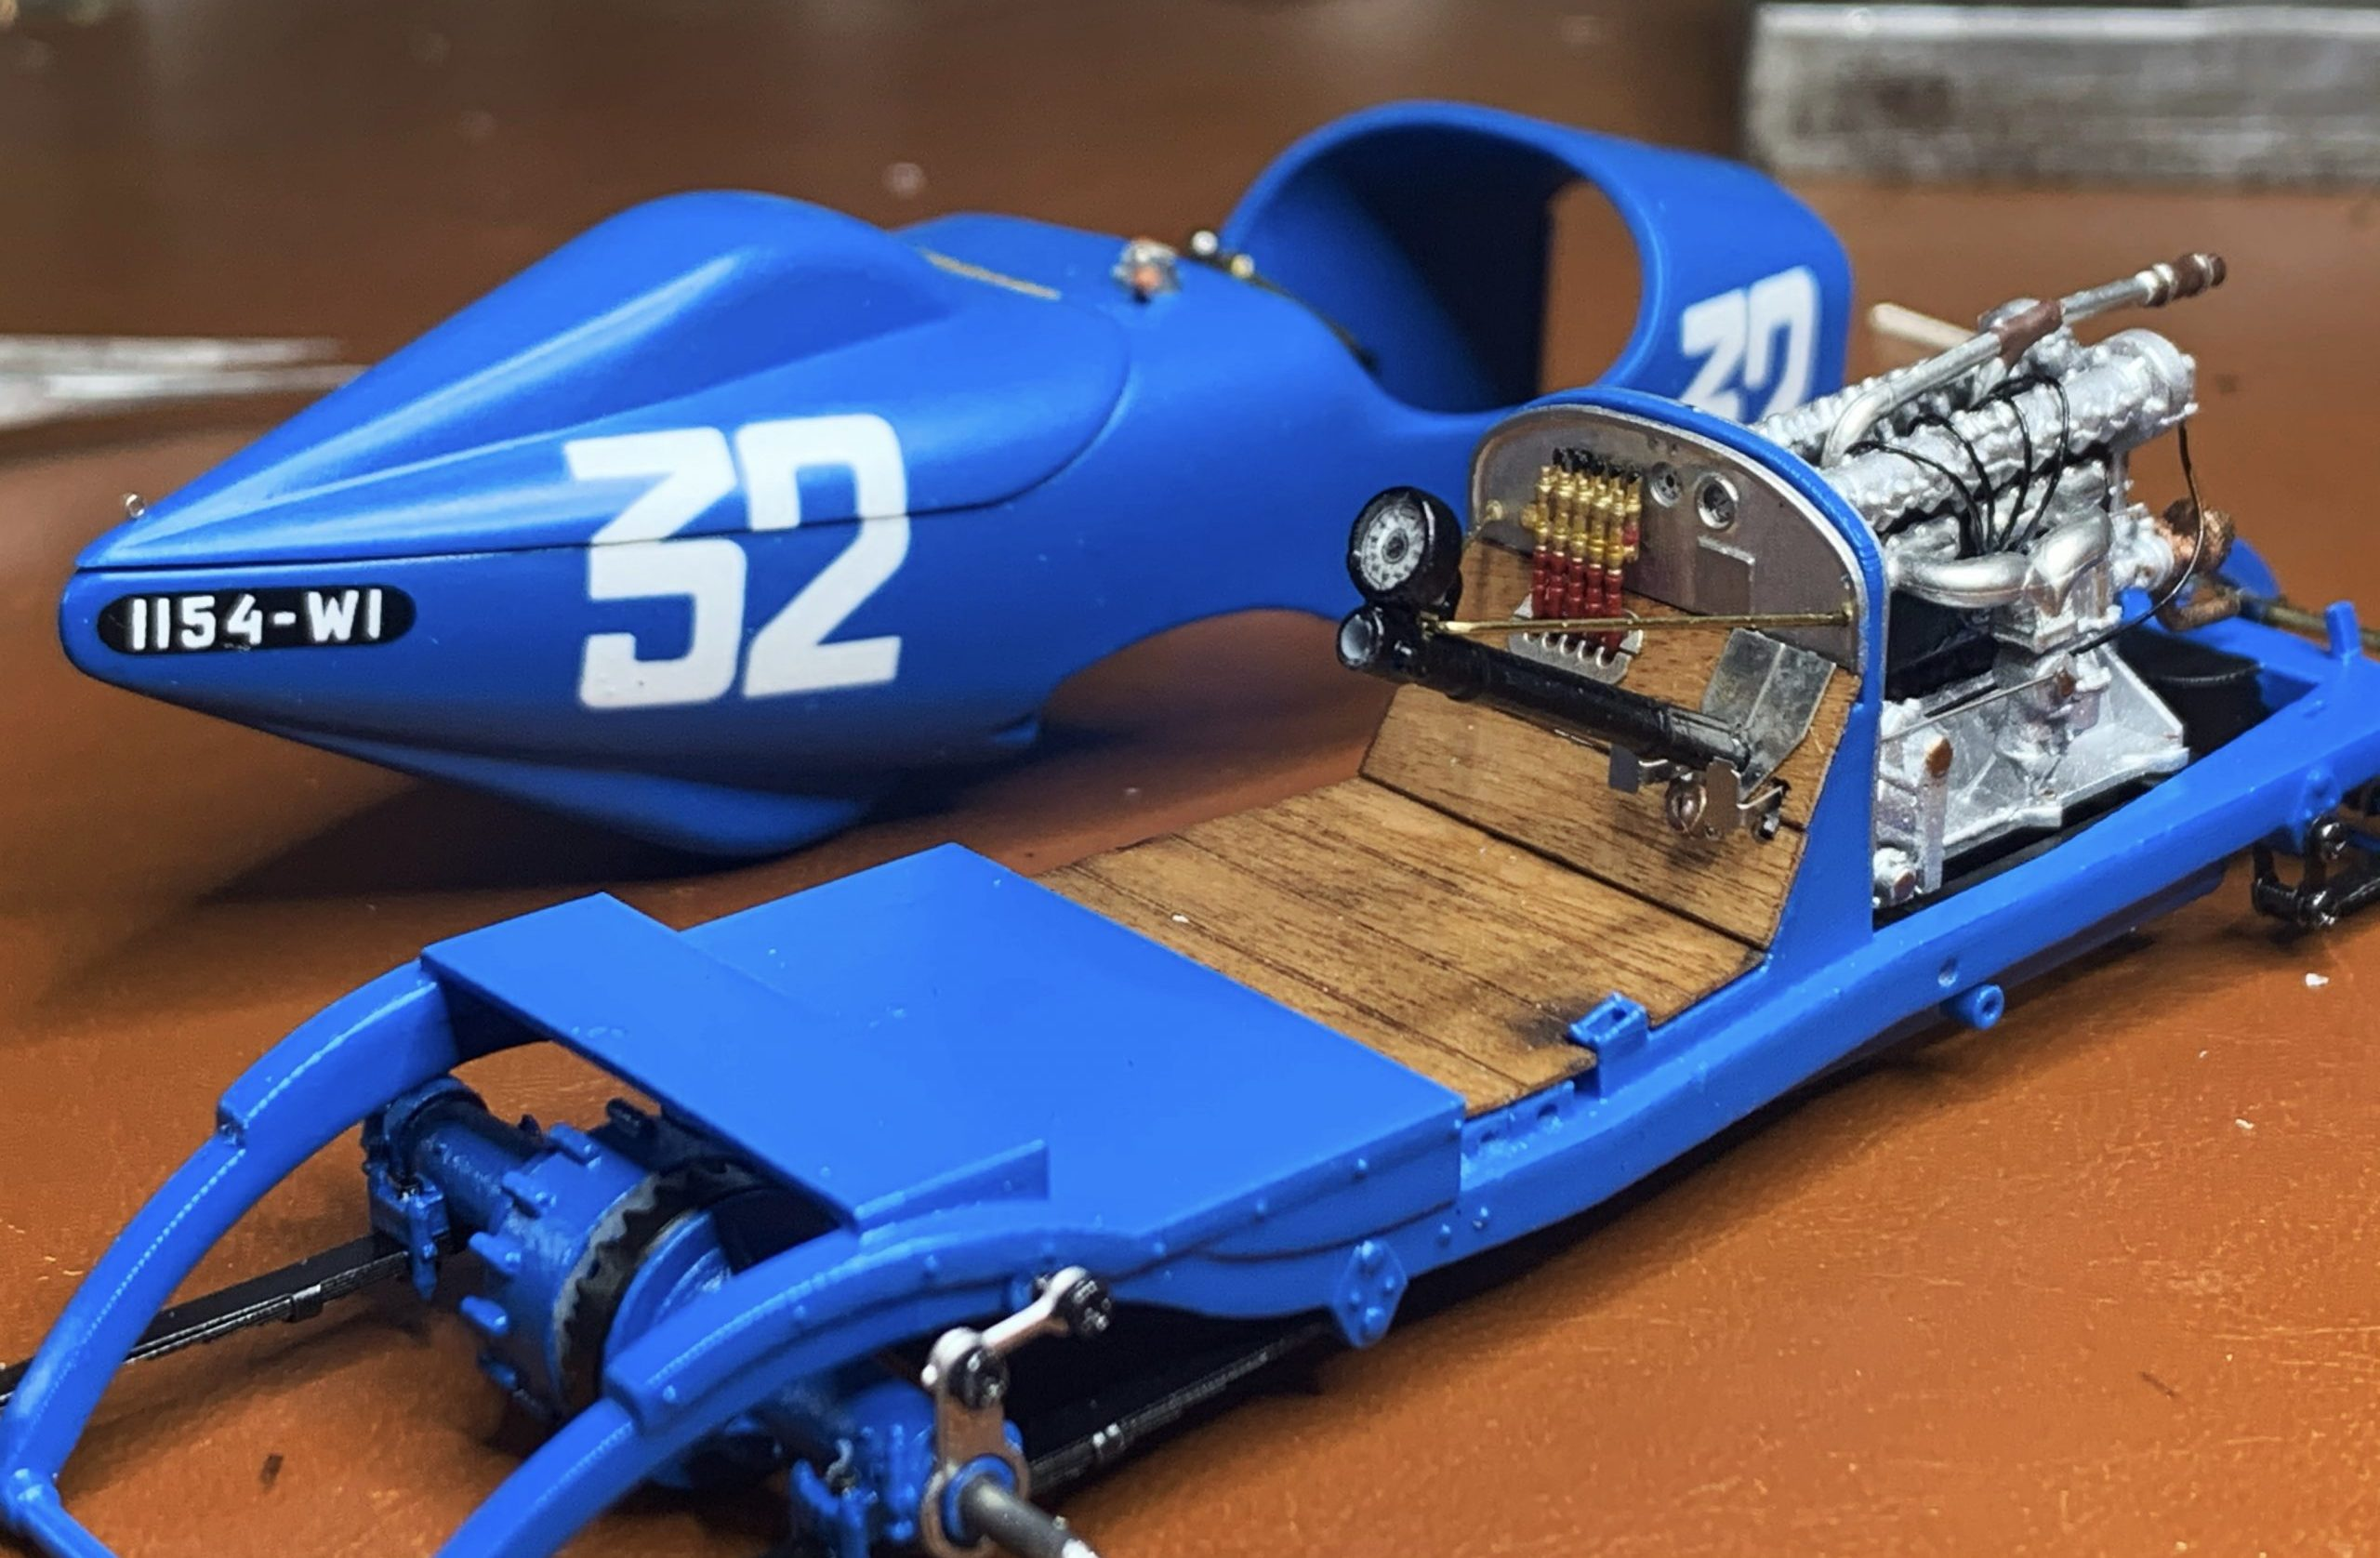 Ramon Cubiro miniatures racer chassis body